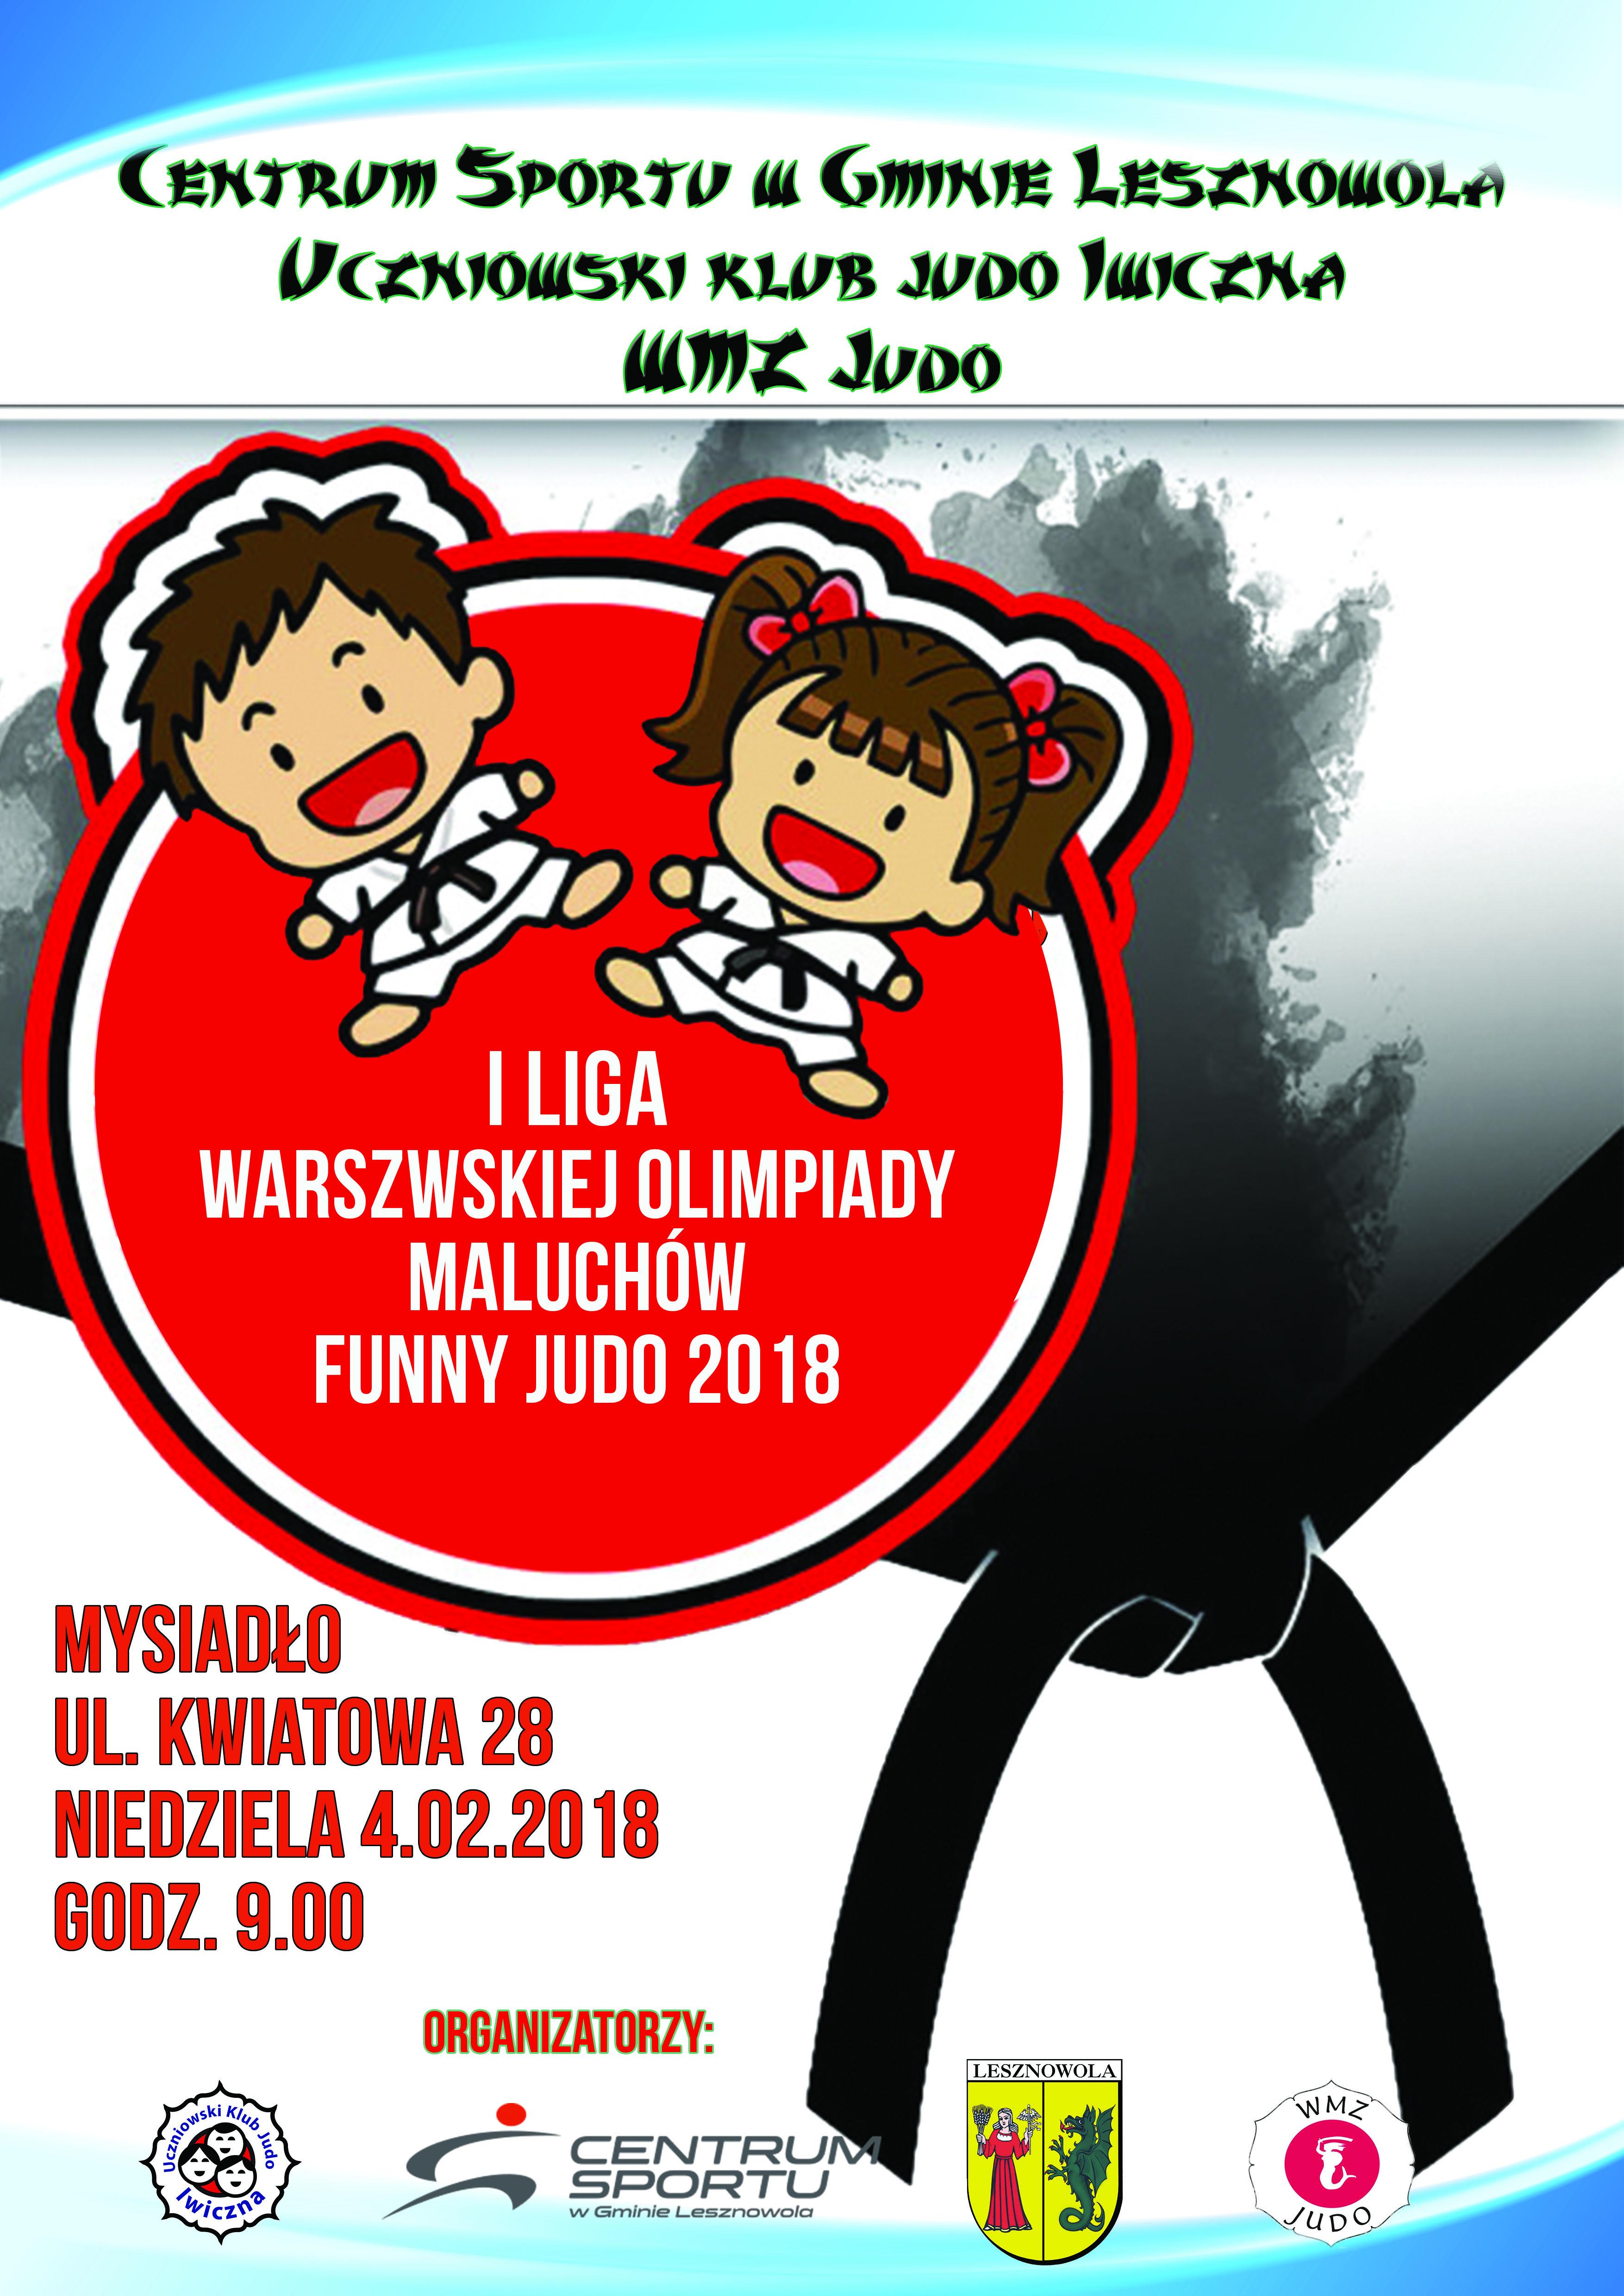 funny judo 2018